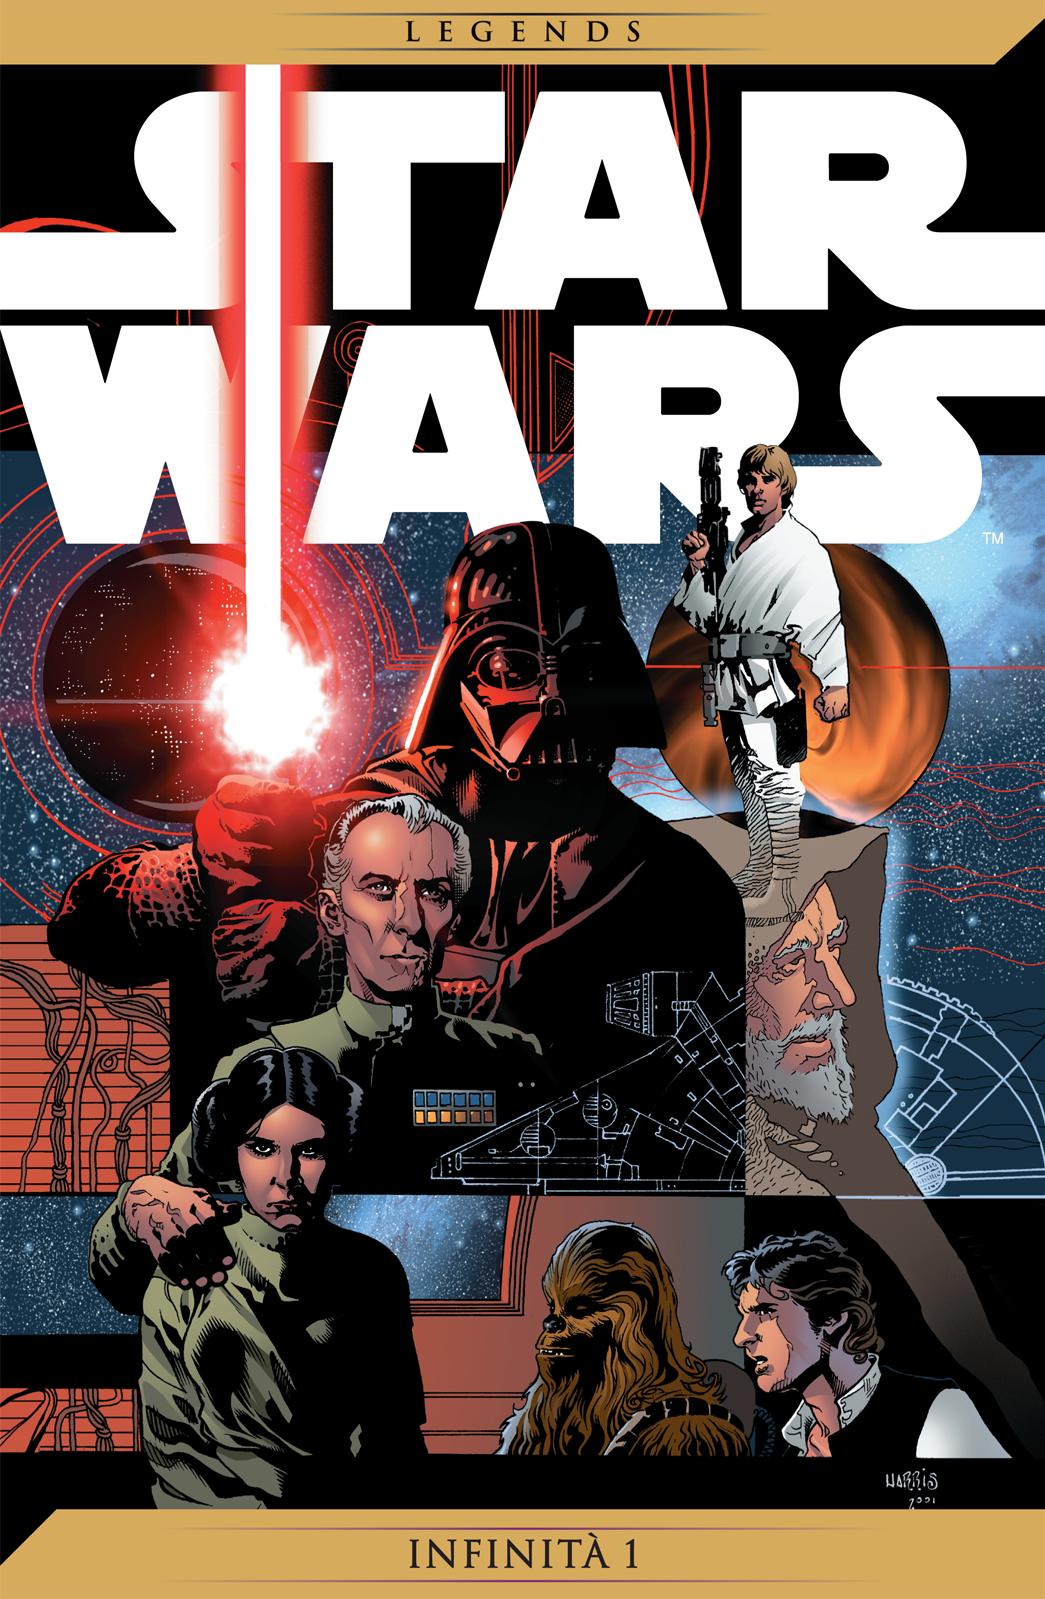 Star Wars Infinità 1 cover